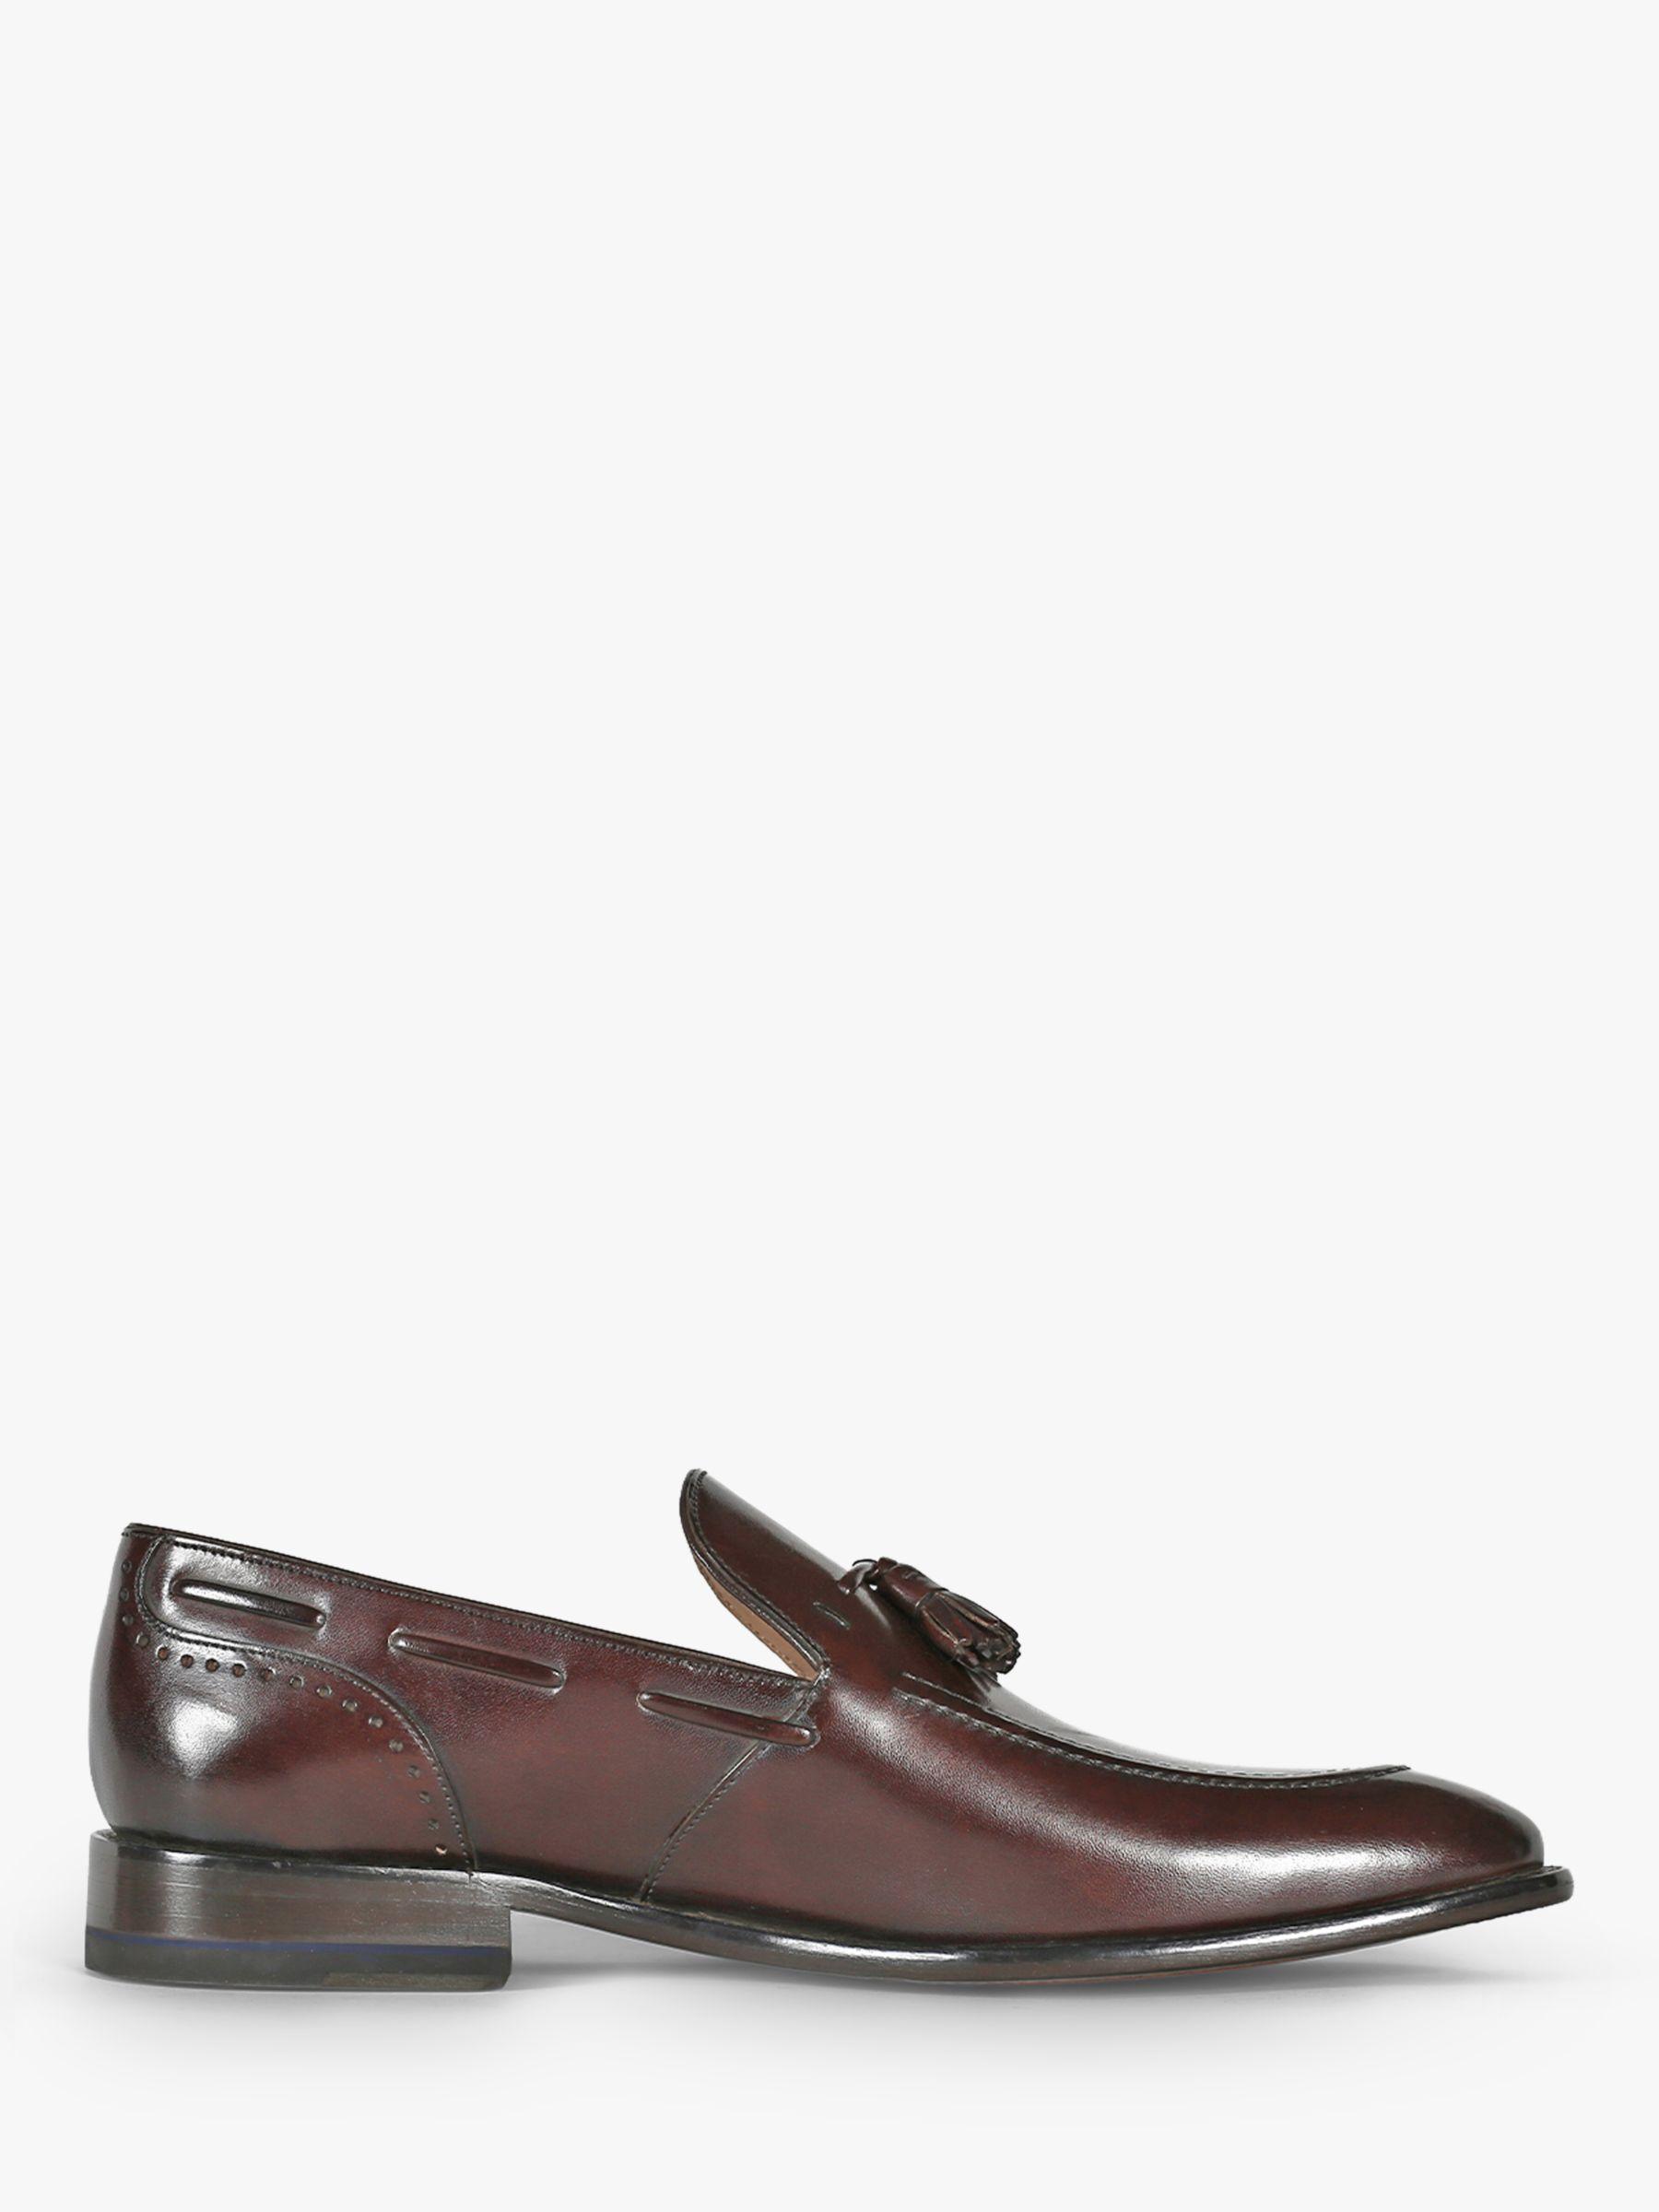 Oliver Sweeney Oliver Sweeney Keasden Leather Loafers, Brown